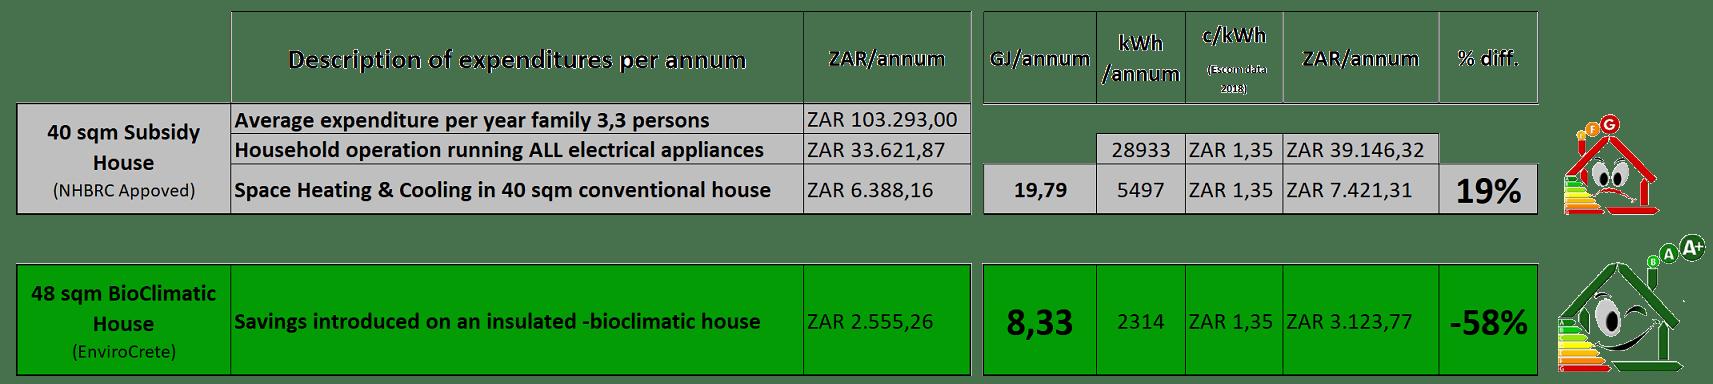 EnviroCrete house energy class A